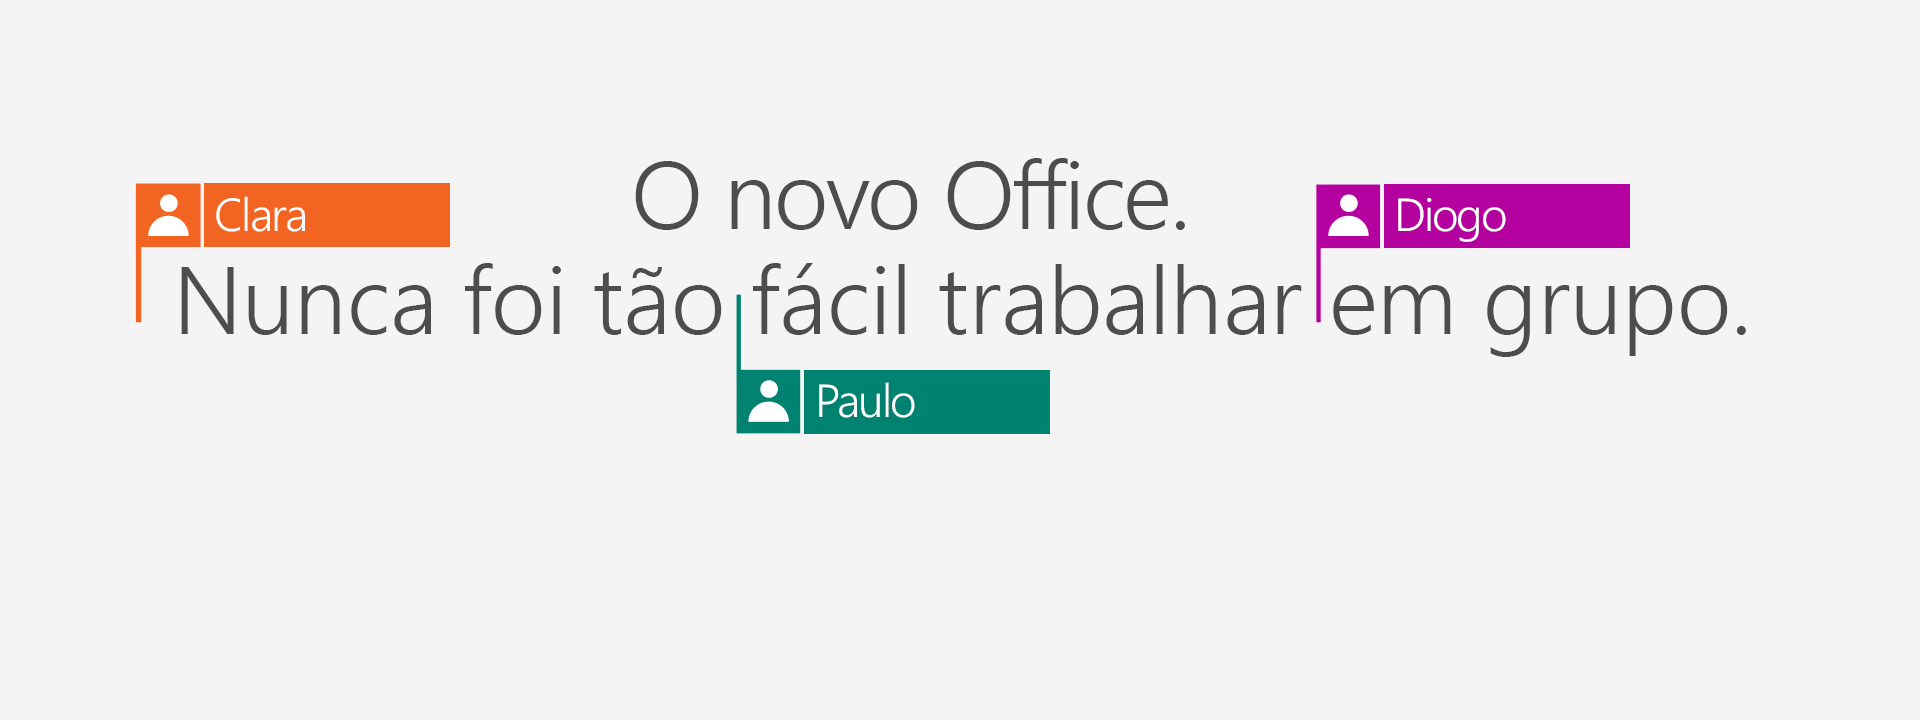 Compre o Office 365 e obtenha os novos aplicativos de 2016.